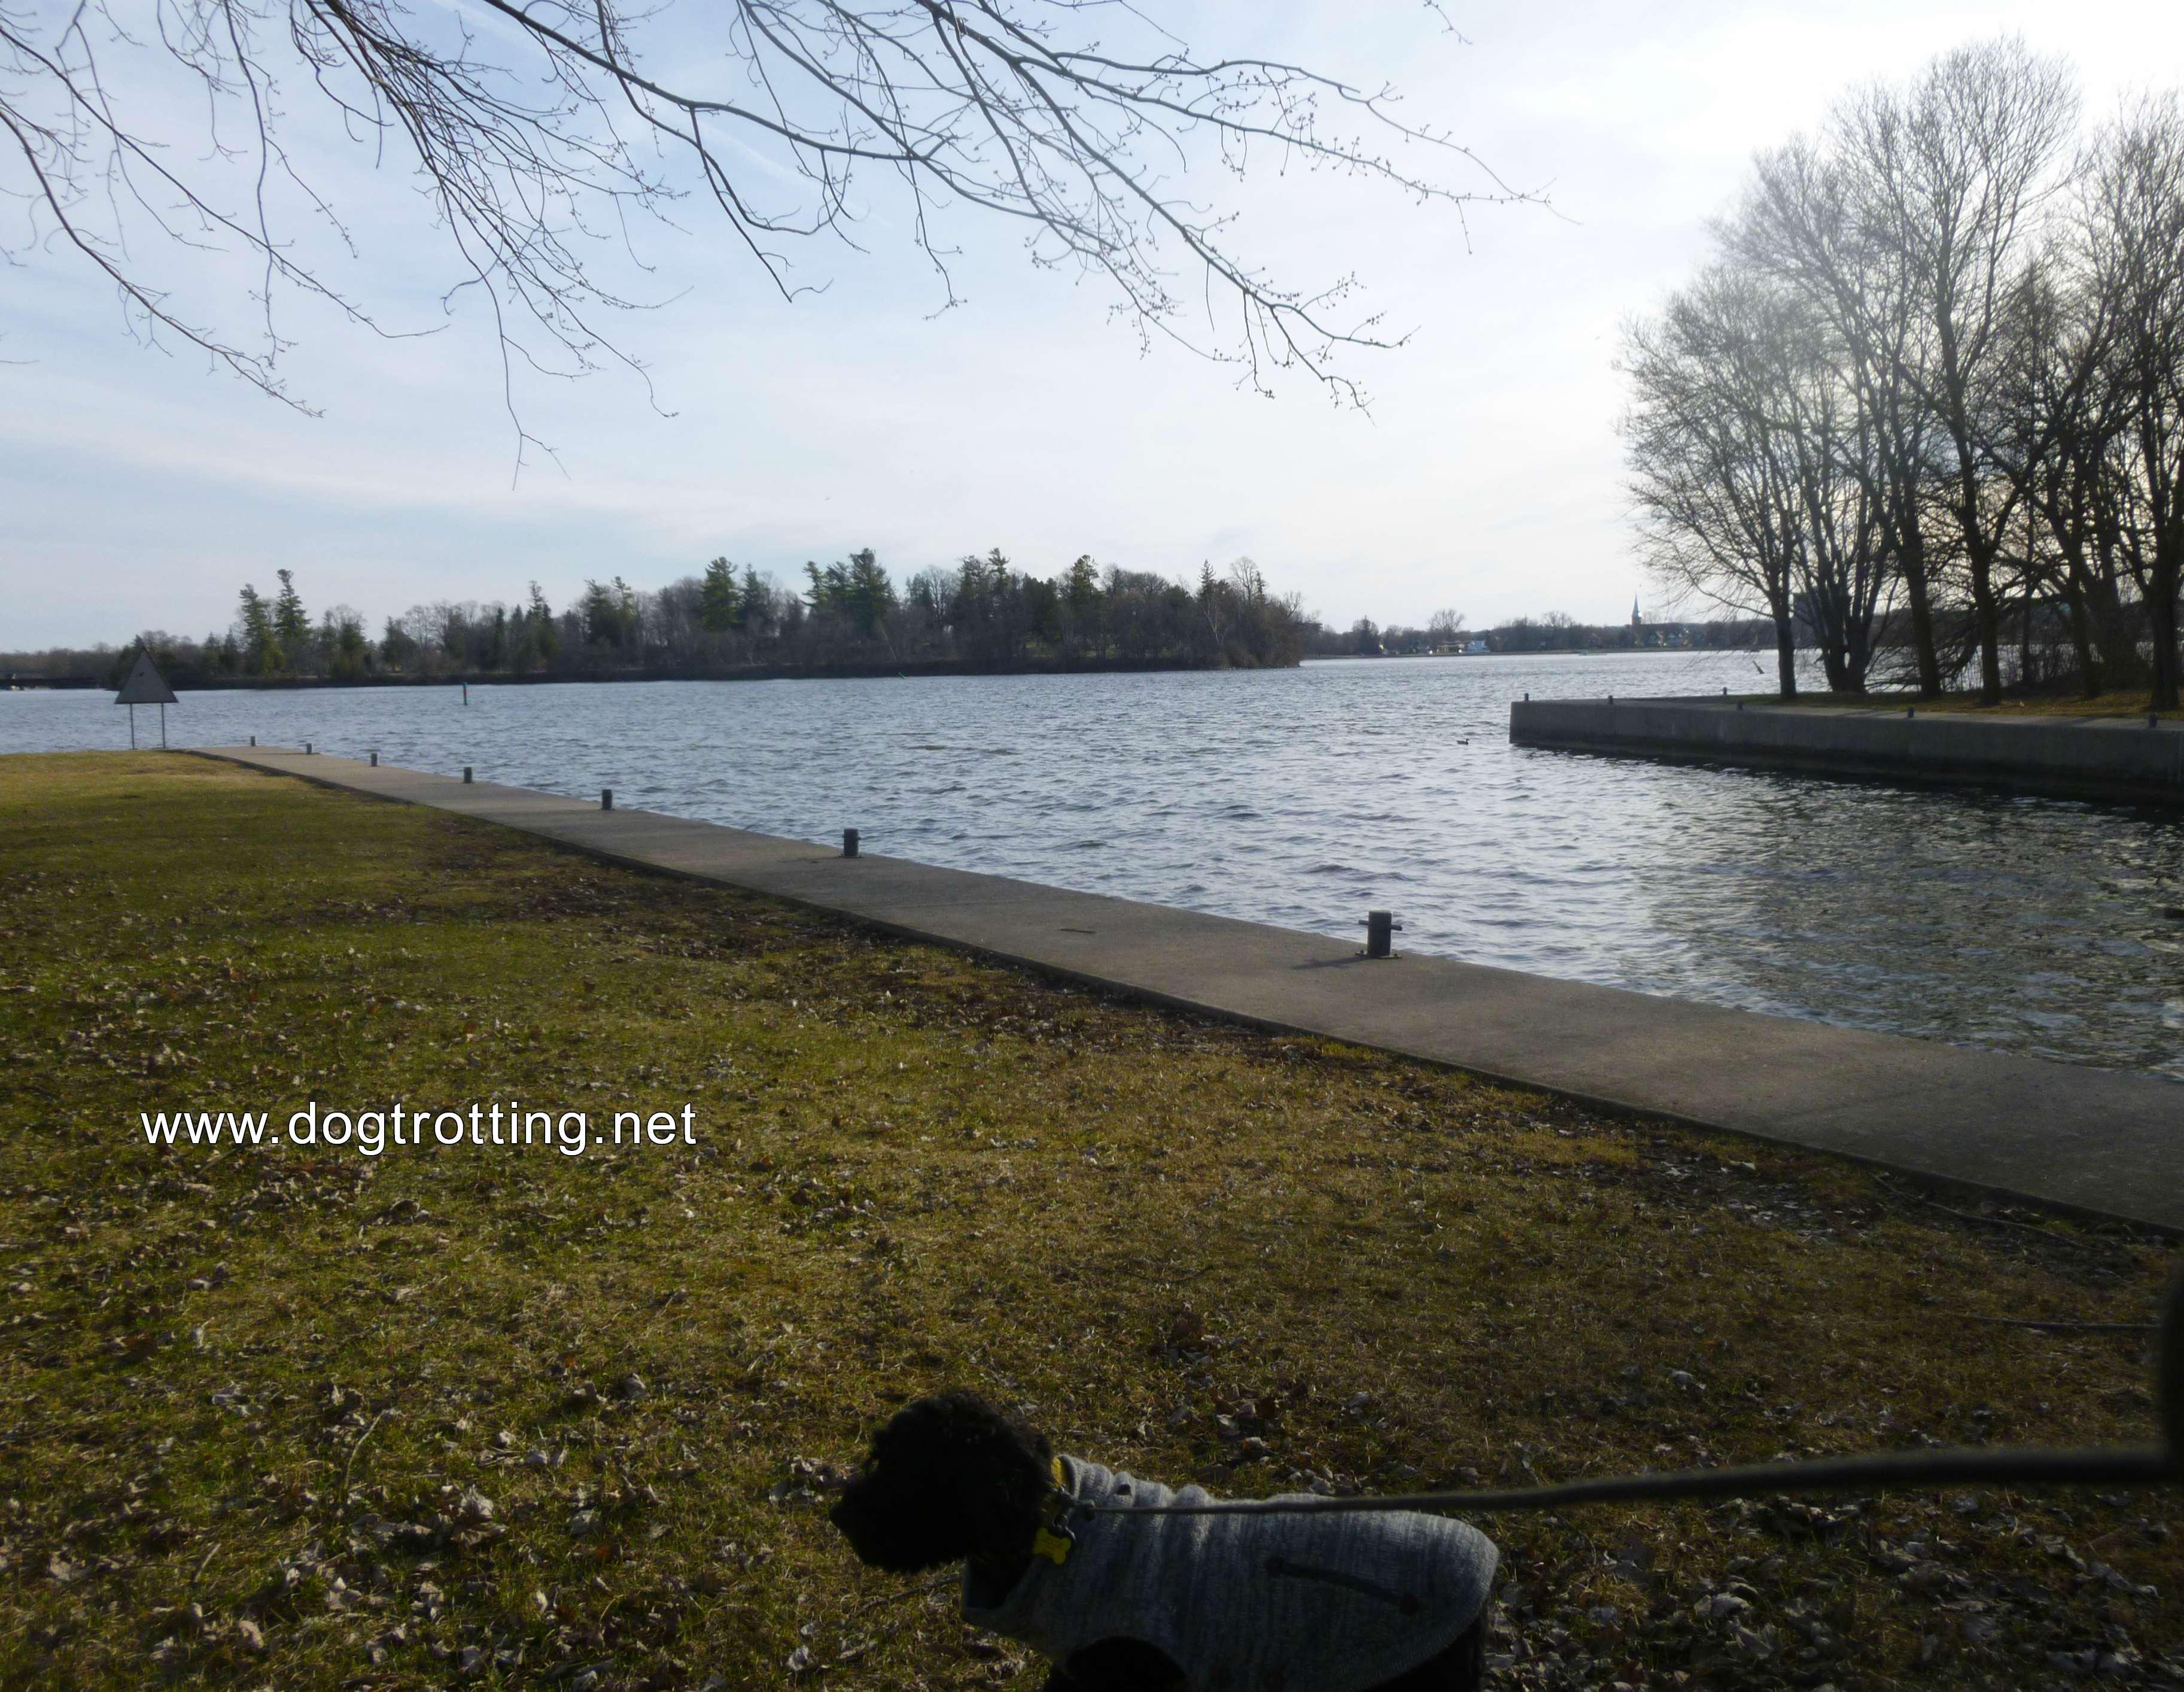 Dog at Beavermead Park, Peterborough, Ontario